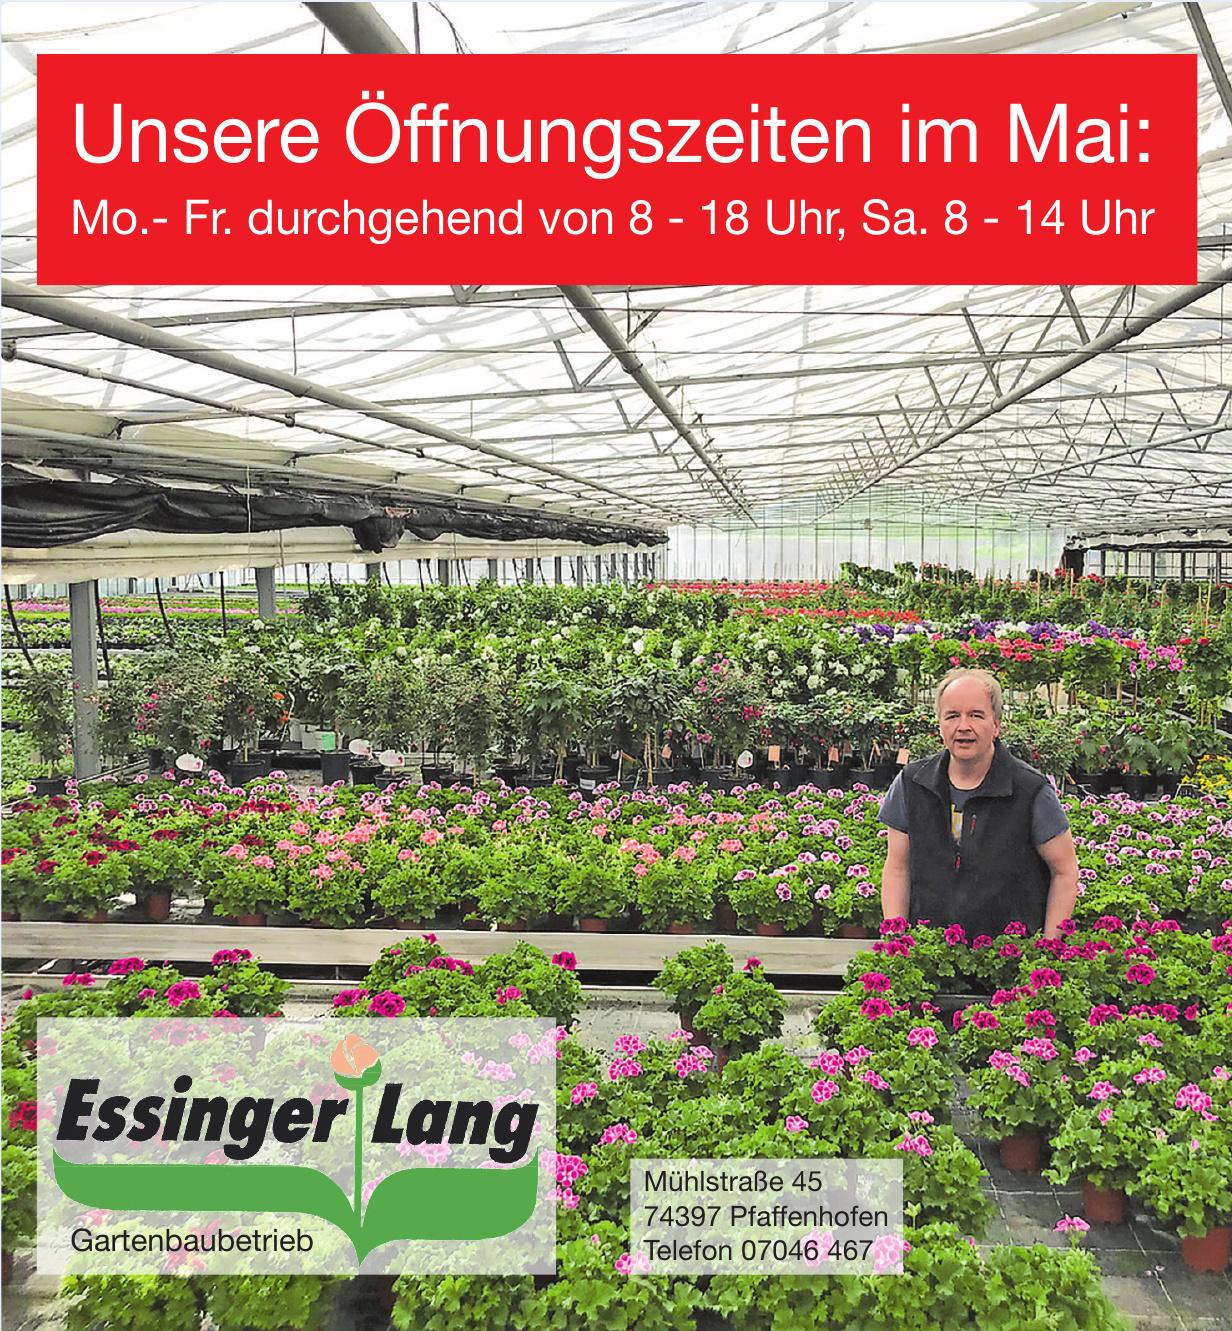 Essinger Lang Gartenbaubetrieb